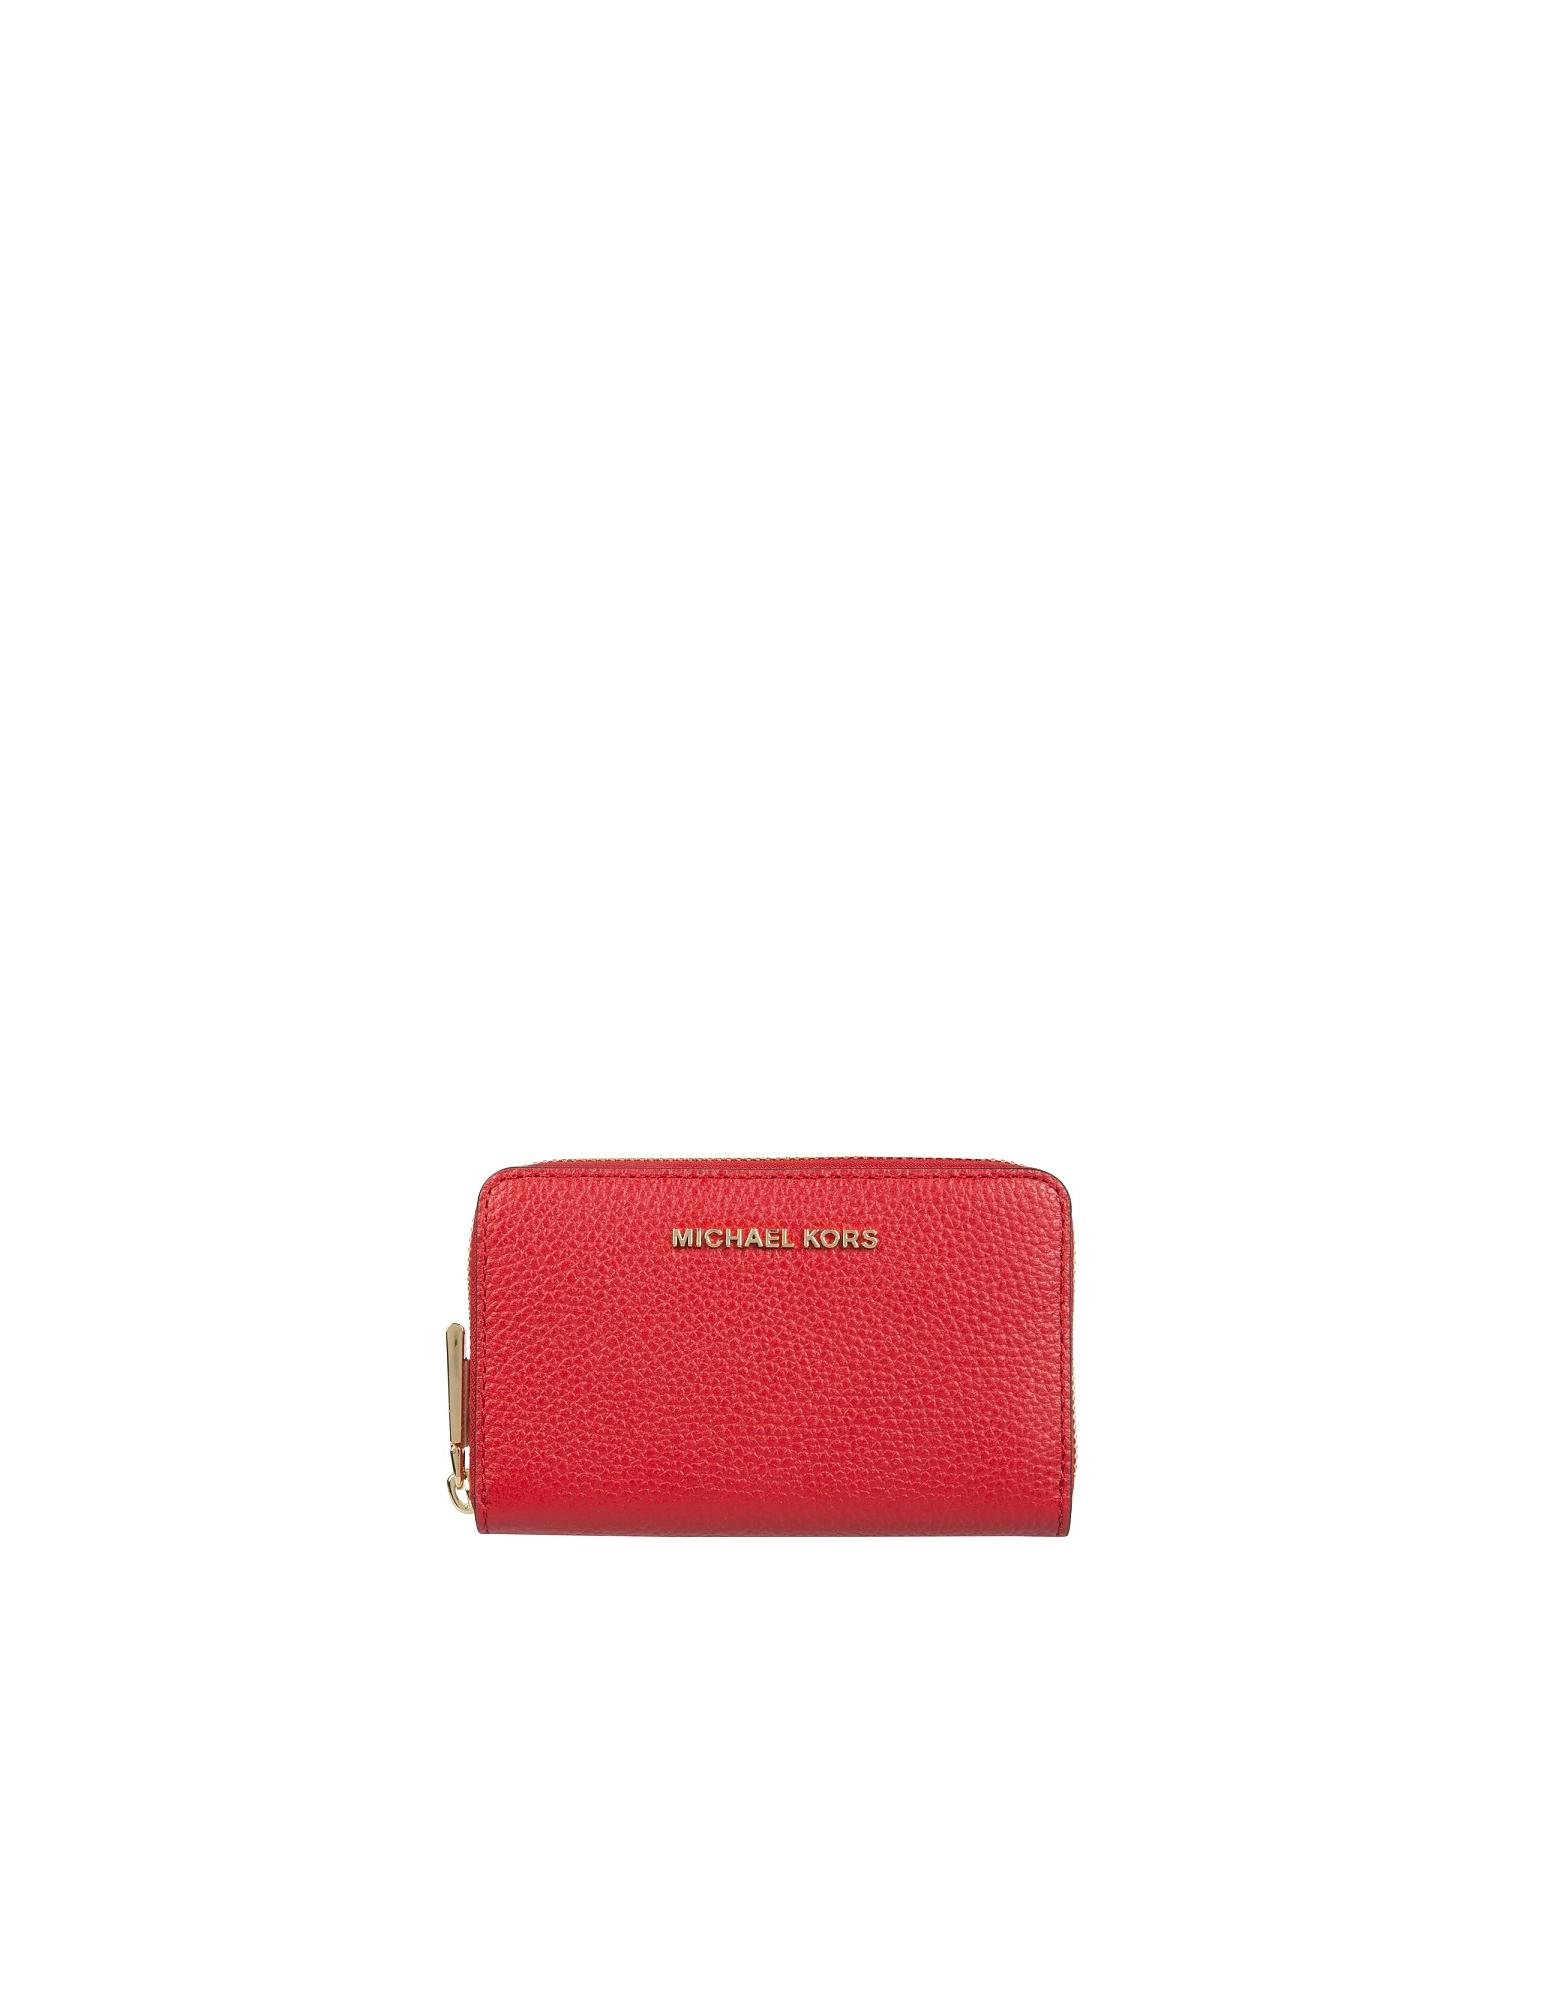 Michael Kors Designer Wallets, Compact Card Holder With Logo